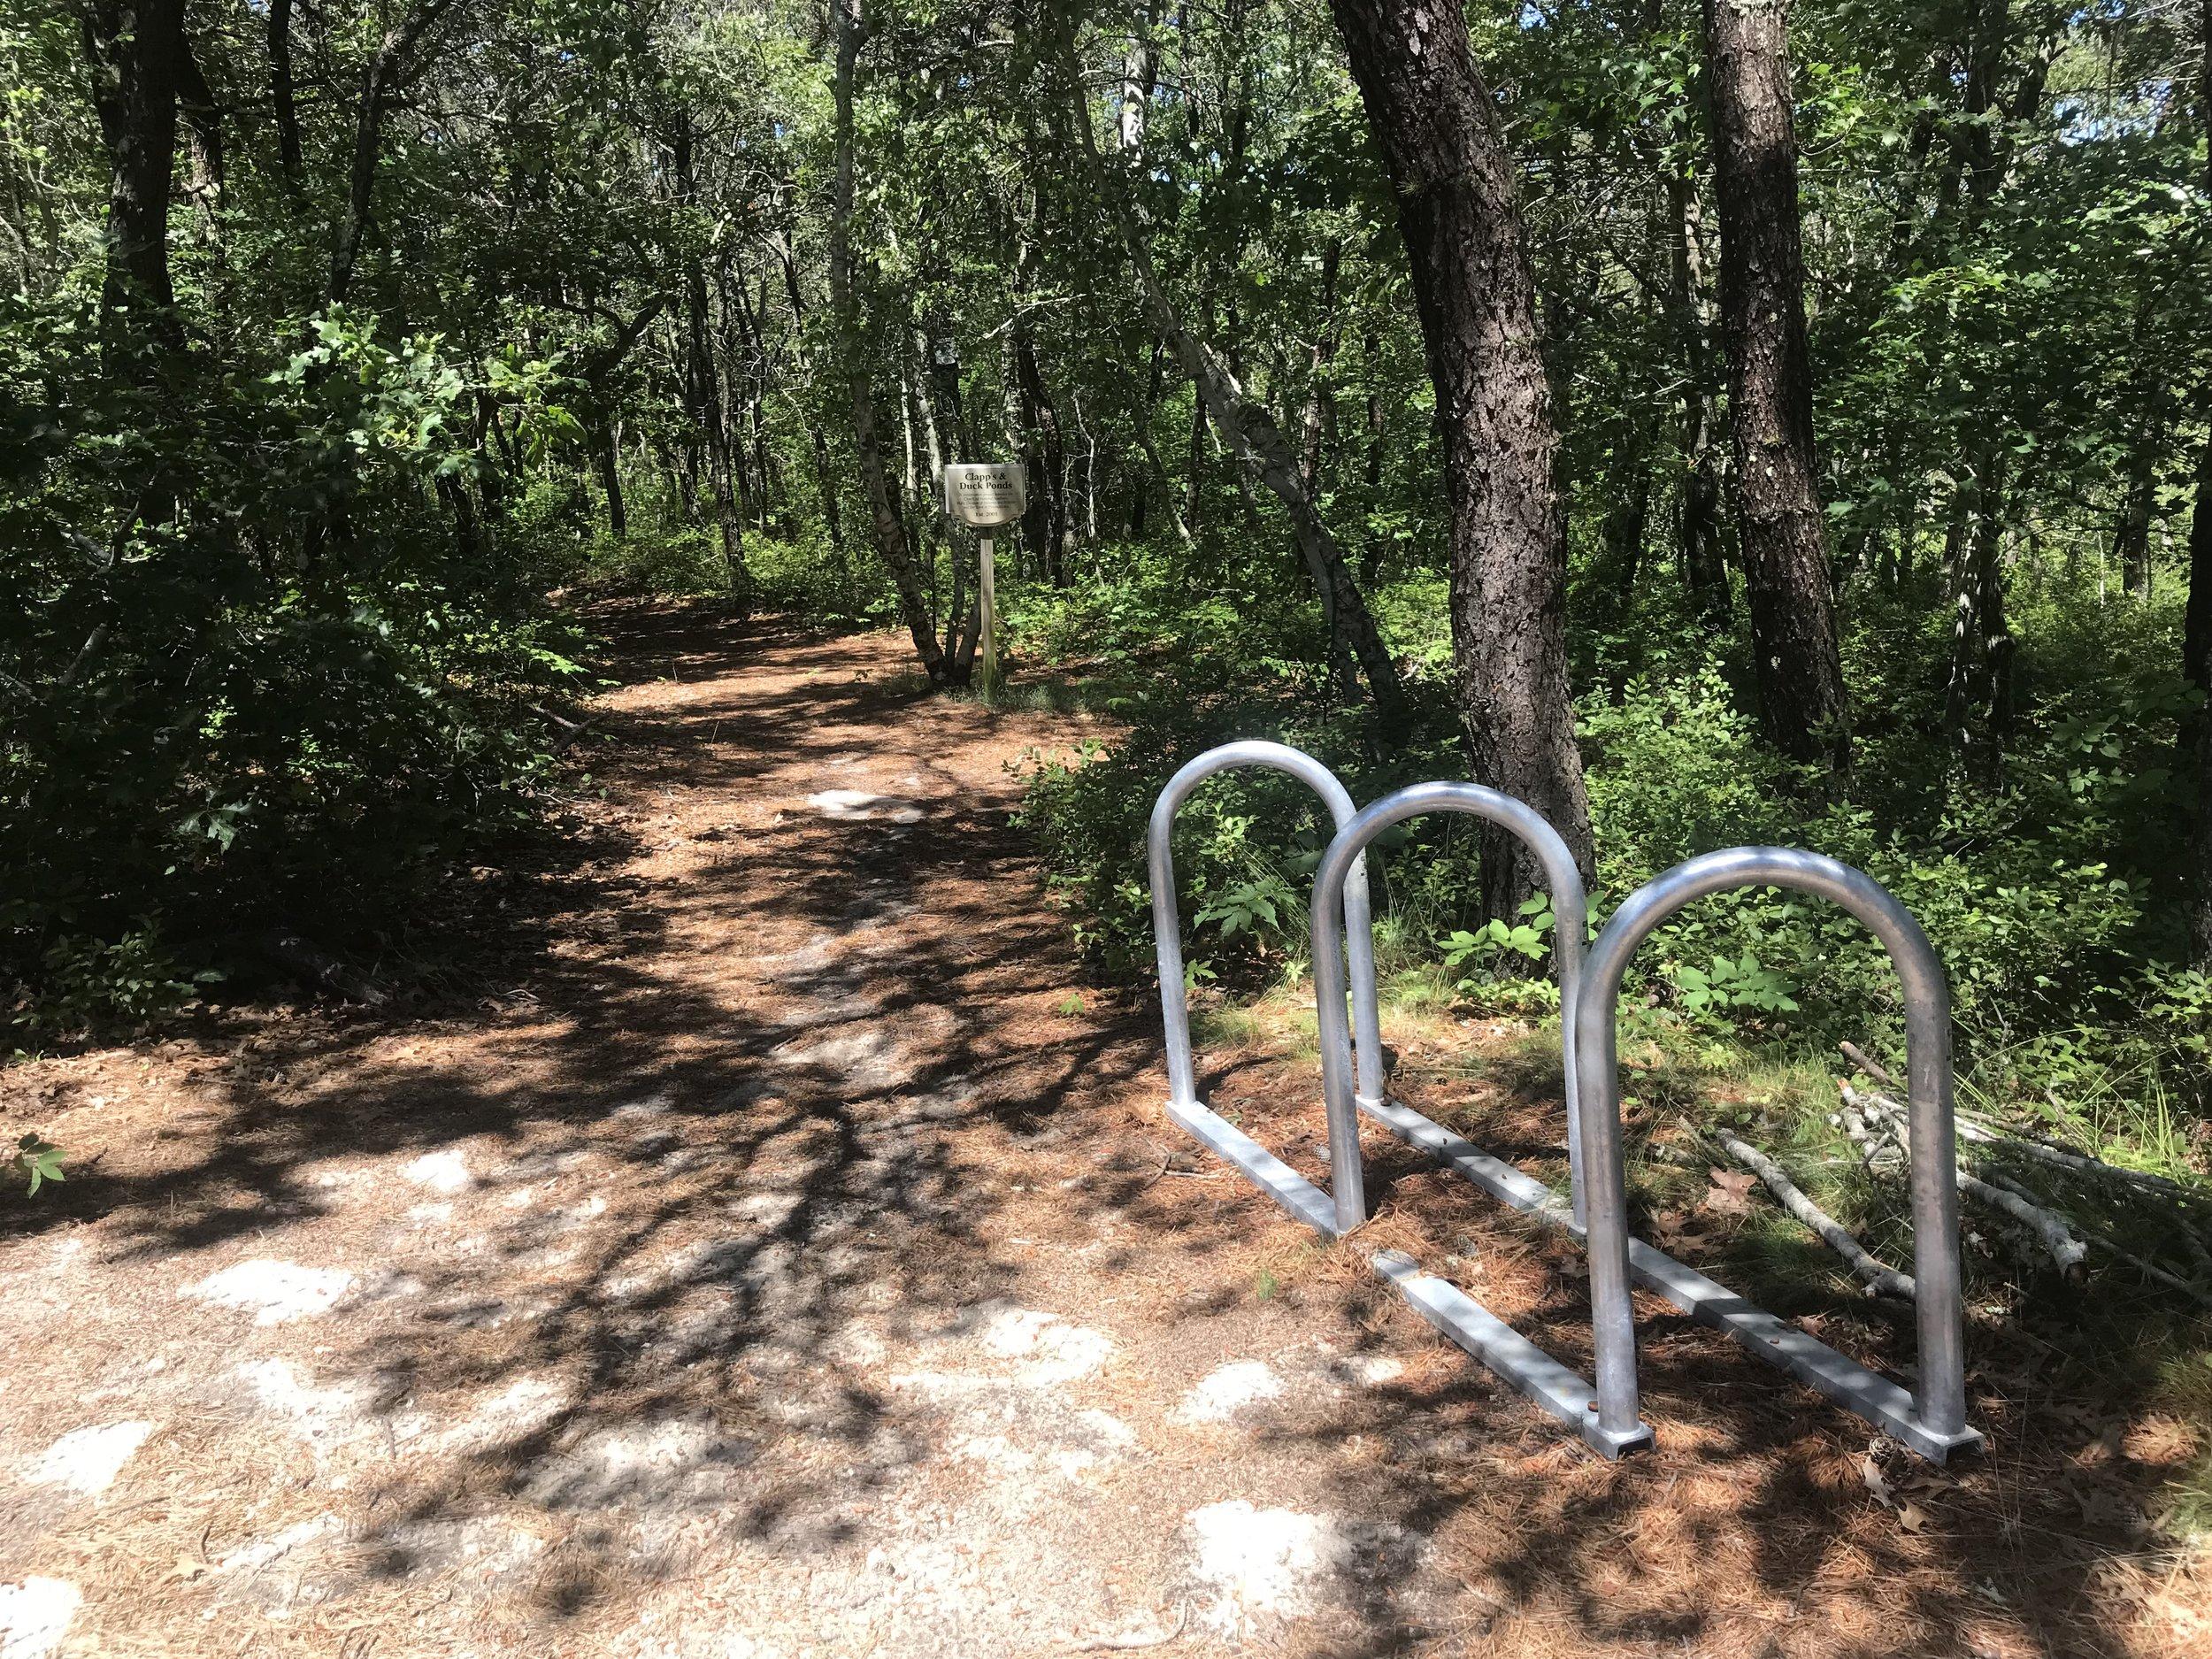 After - One 6-bike Saris corral rack